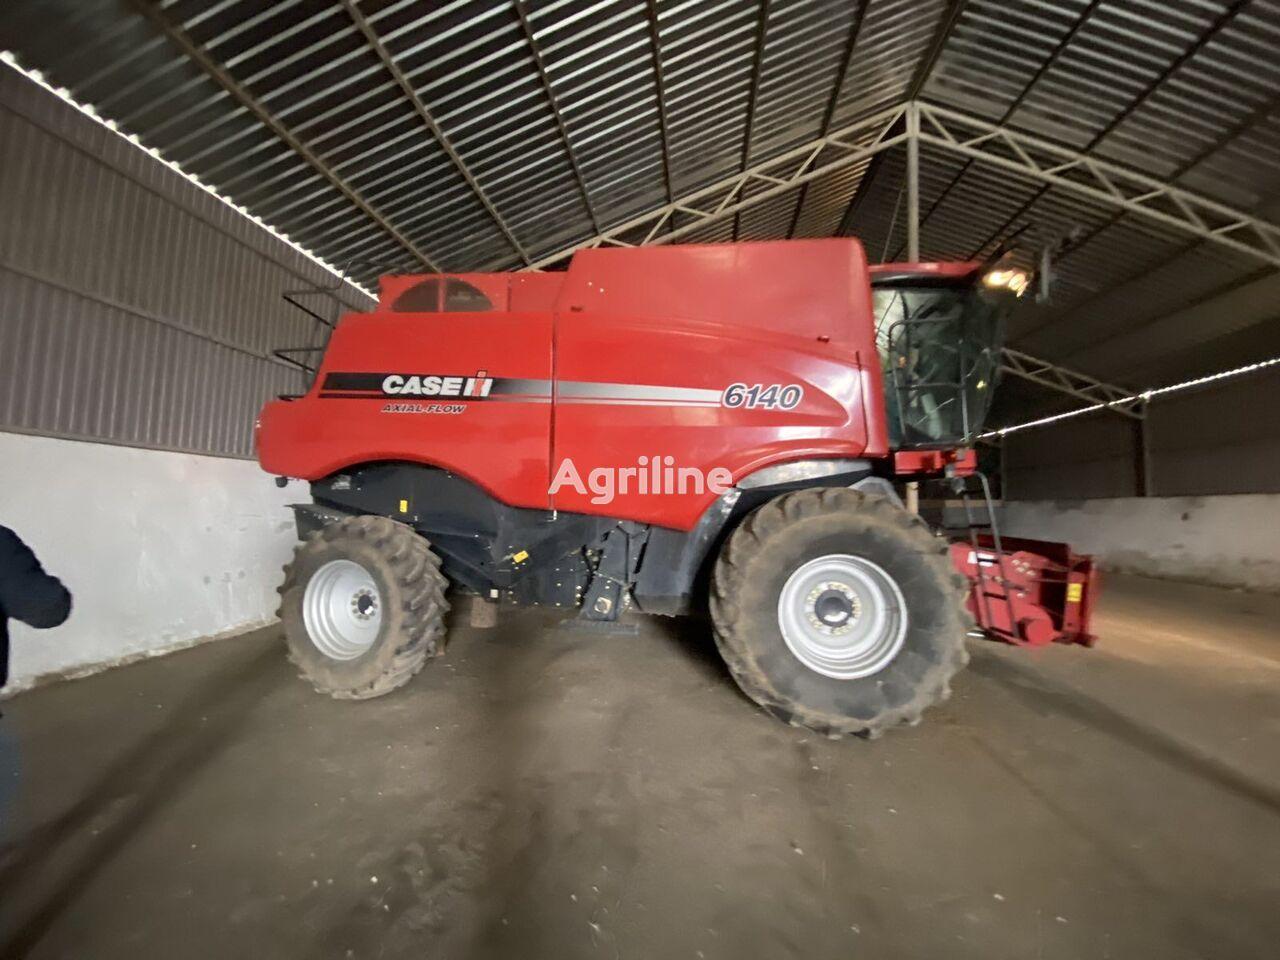 CASE IH 6140 Axial Flow v Lizing grain harvester